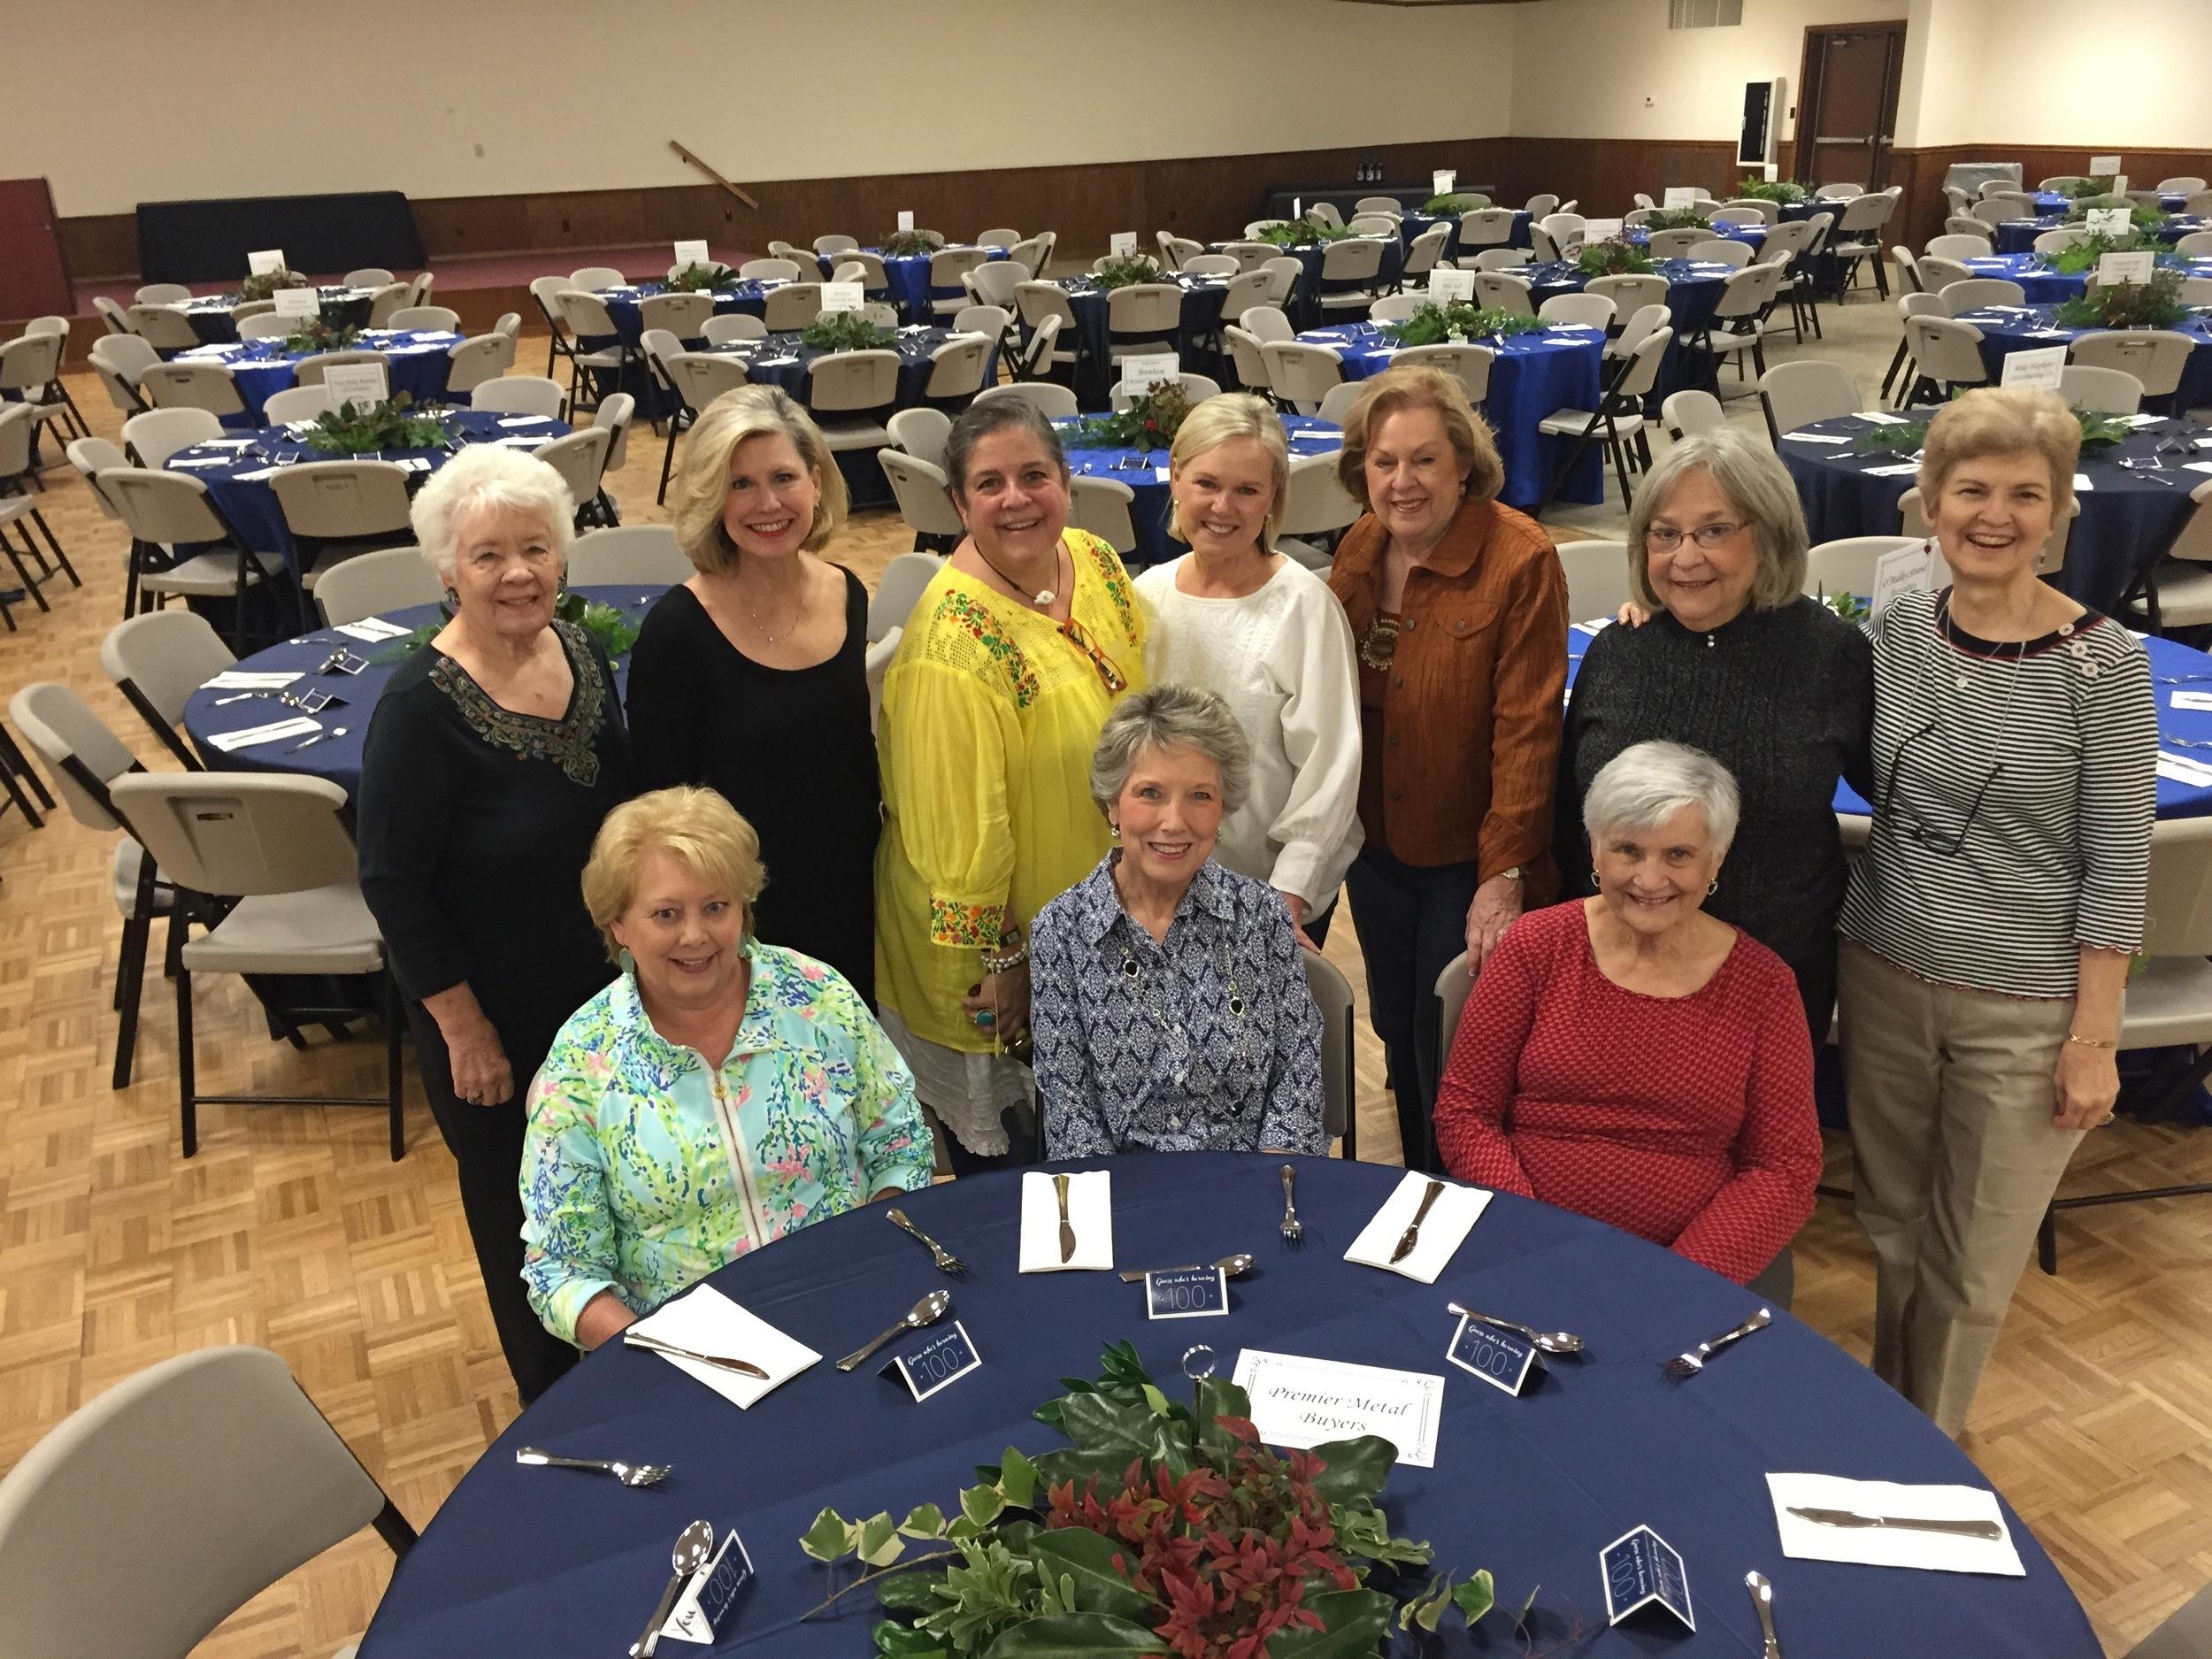 Beautiful job, ladies. Seated - Linda Blum, President, Sherry Barkman, Carolyn Sander. Standing - Merlene Schumacher, Debbie Urquhart, Shannon Webb, Lana McDaniel, Betsy Striegler, Scottie Davis, Donna Bennett.